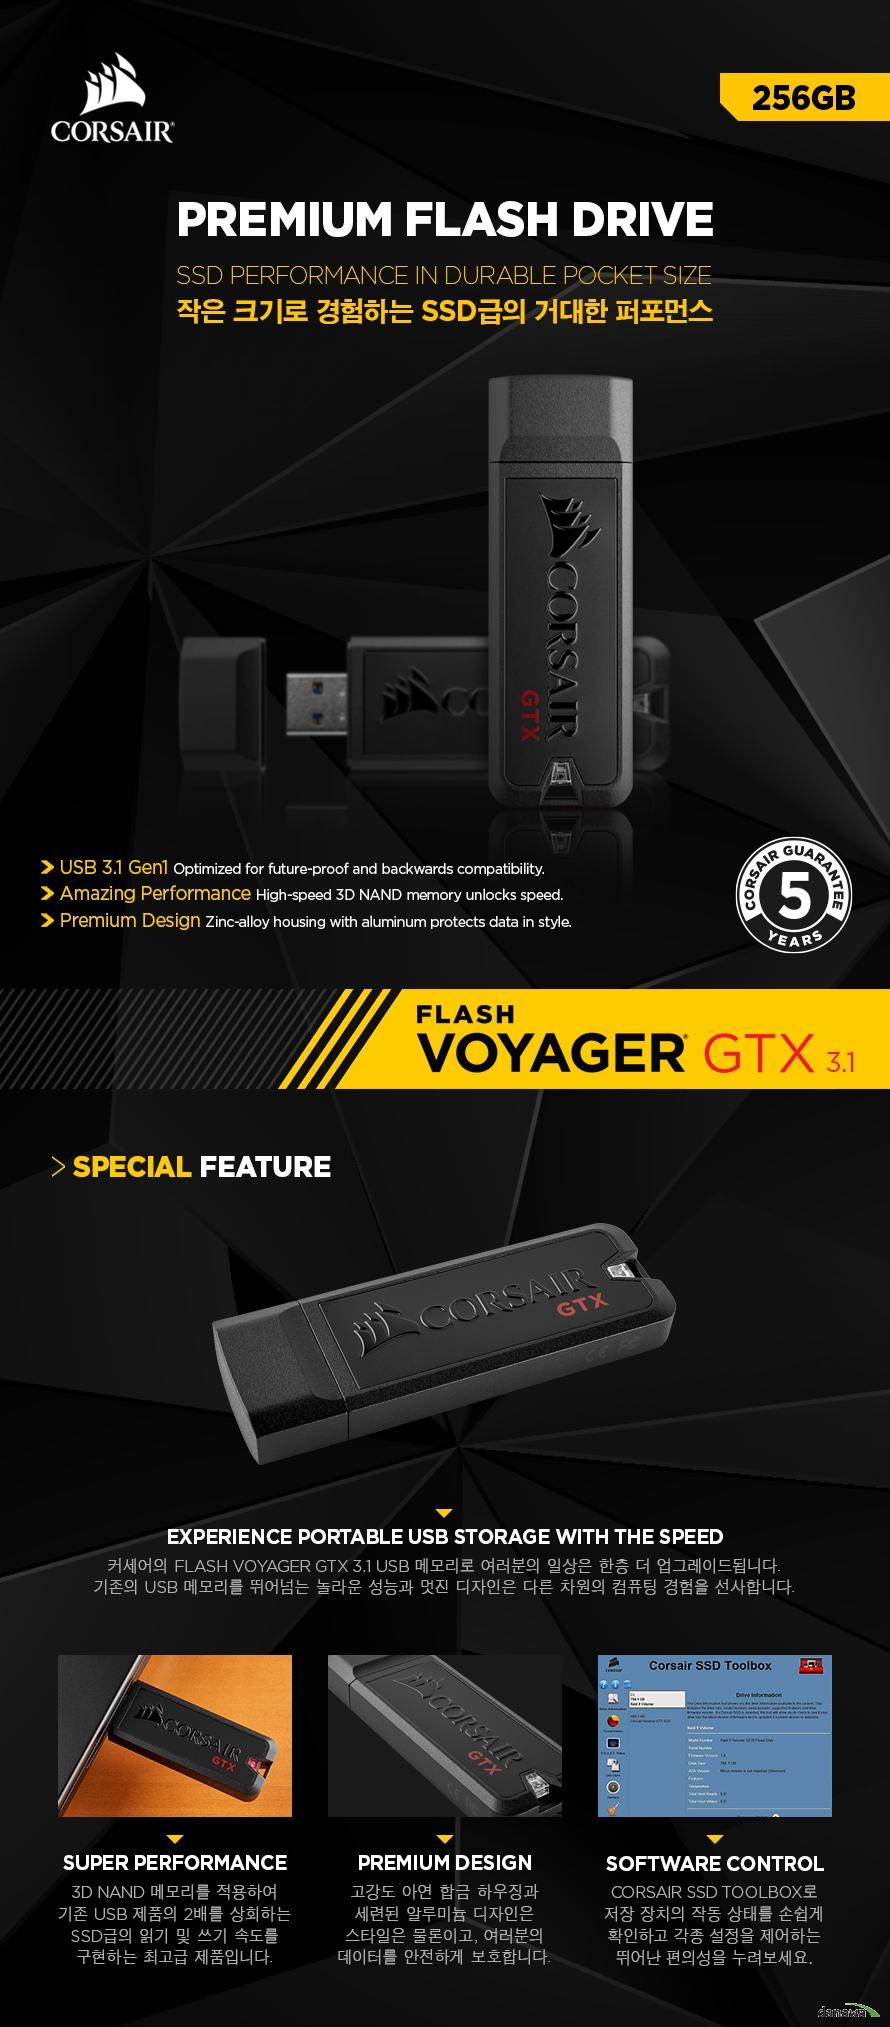 CORSAIR UFD Flash Voyager GTX 3.1 작은 크기로 경험하는 SSD급의 거대한 퍼포먼스